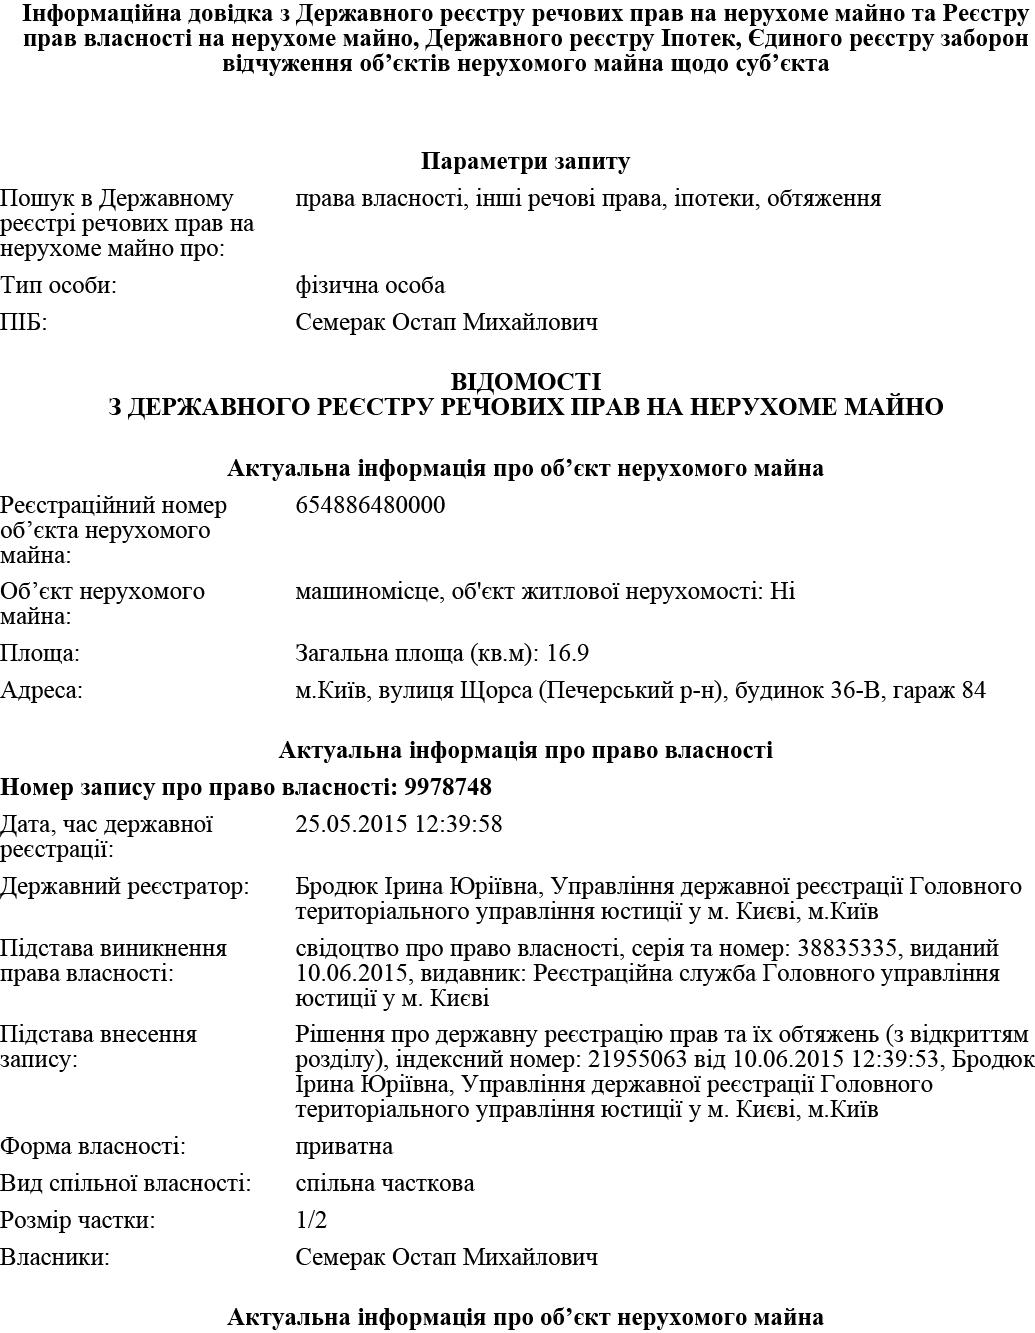 InformDovidka (1)_1